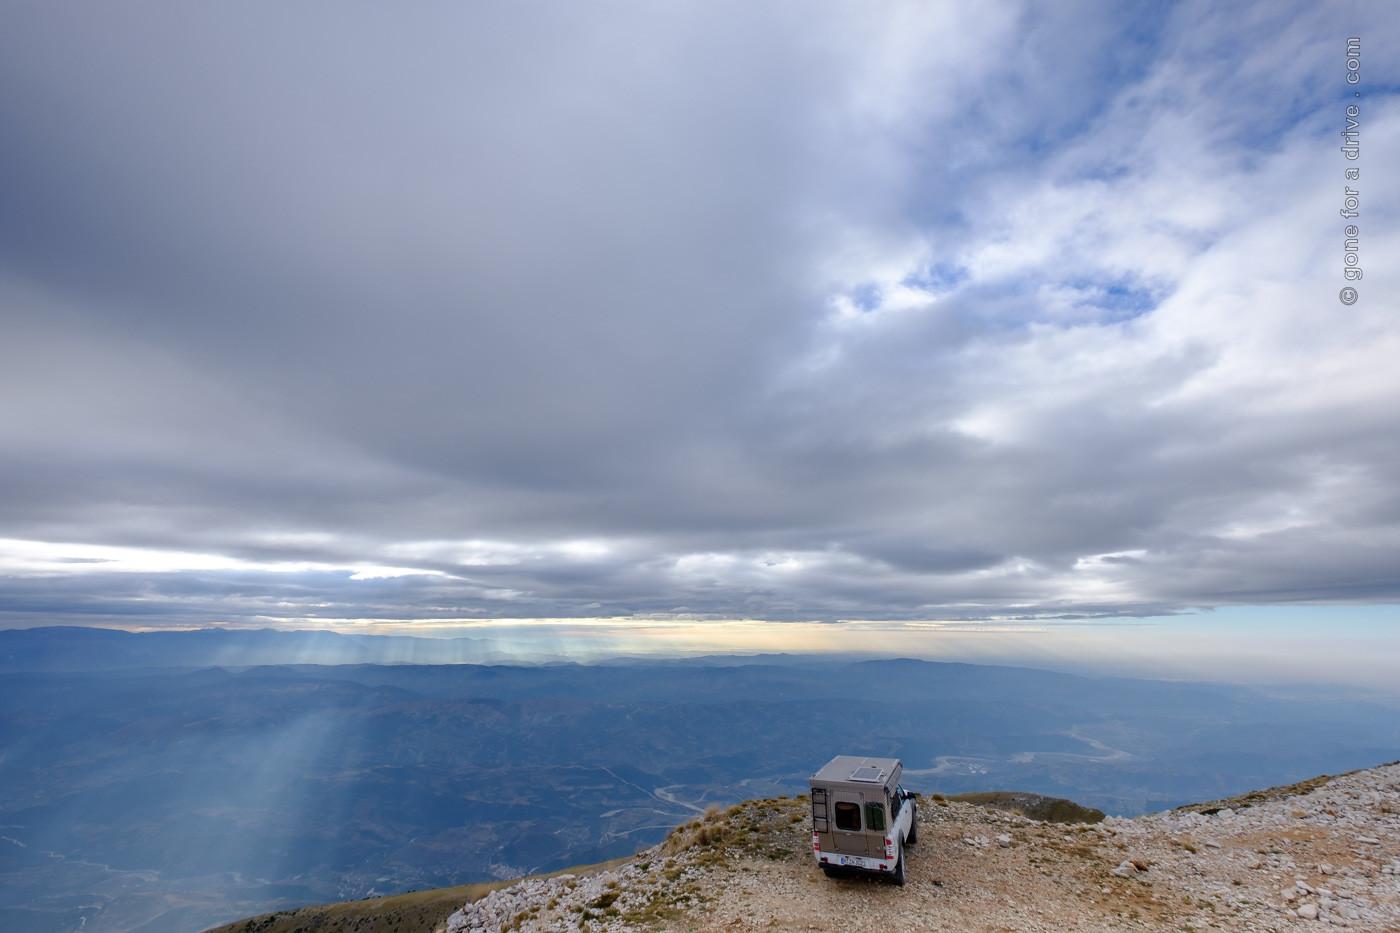 Allrad Camper auf dem Gipfel des Mount Tomorr, Albanien, mit Blick ins Tal.